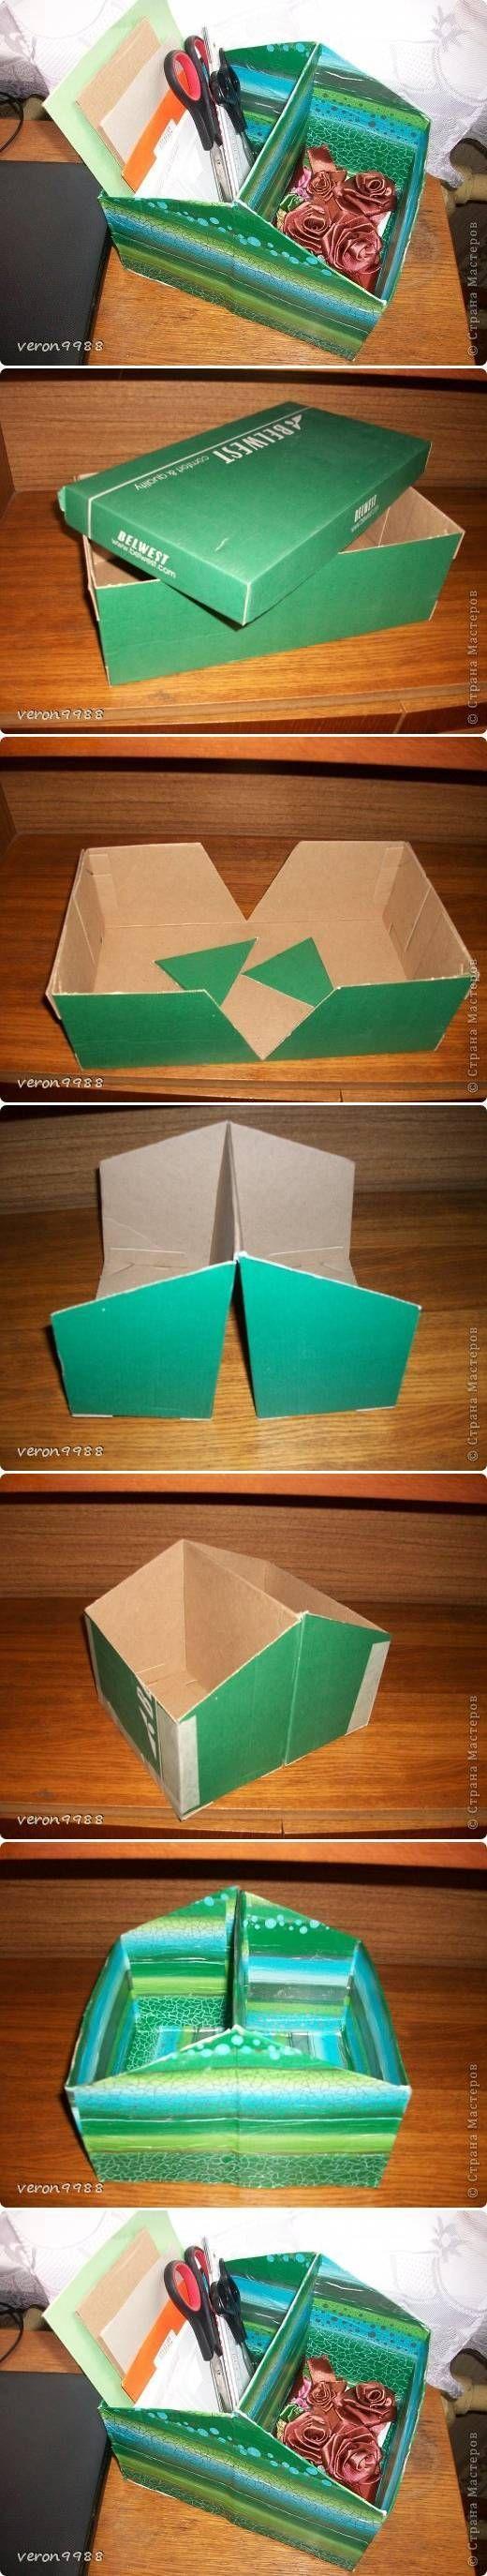 DIY Shoe Box Organizer: